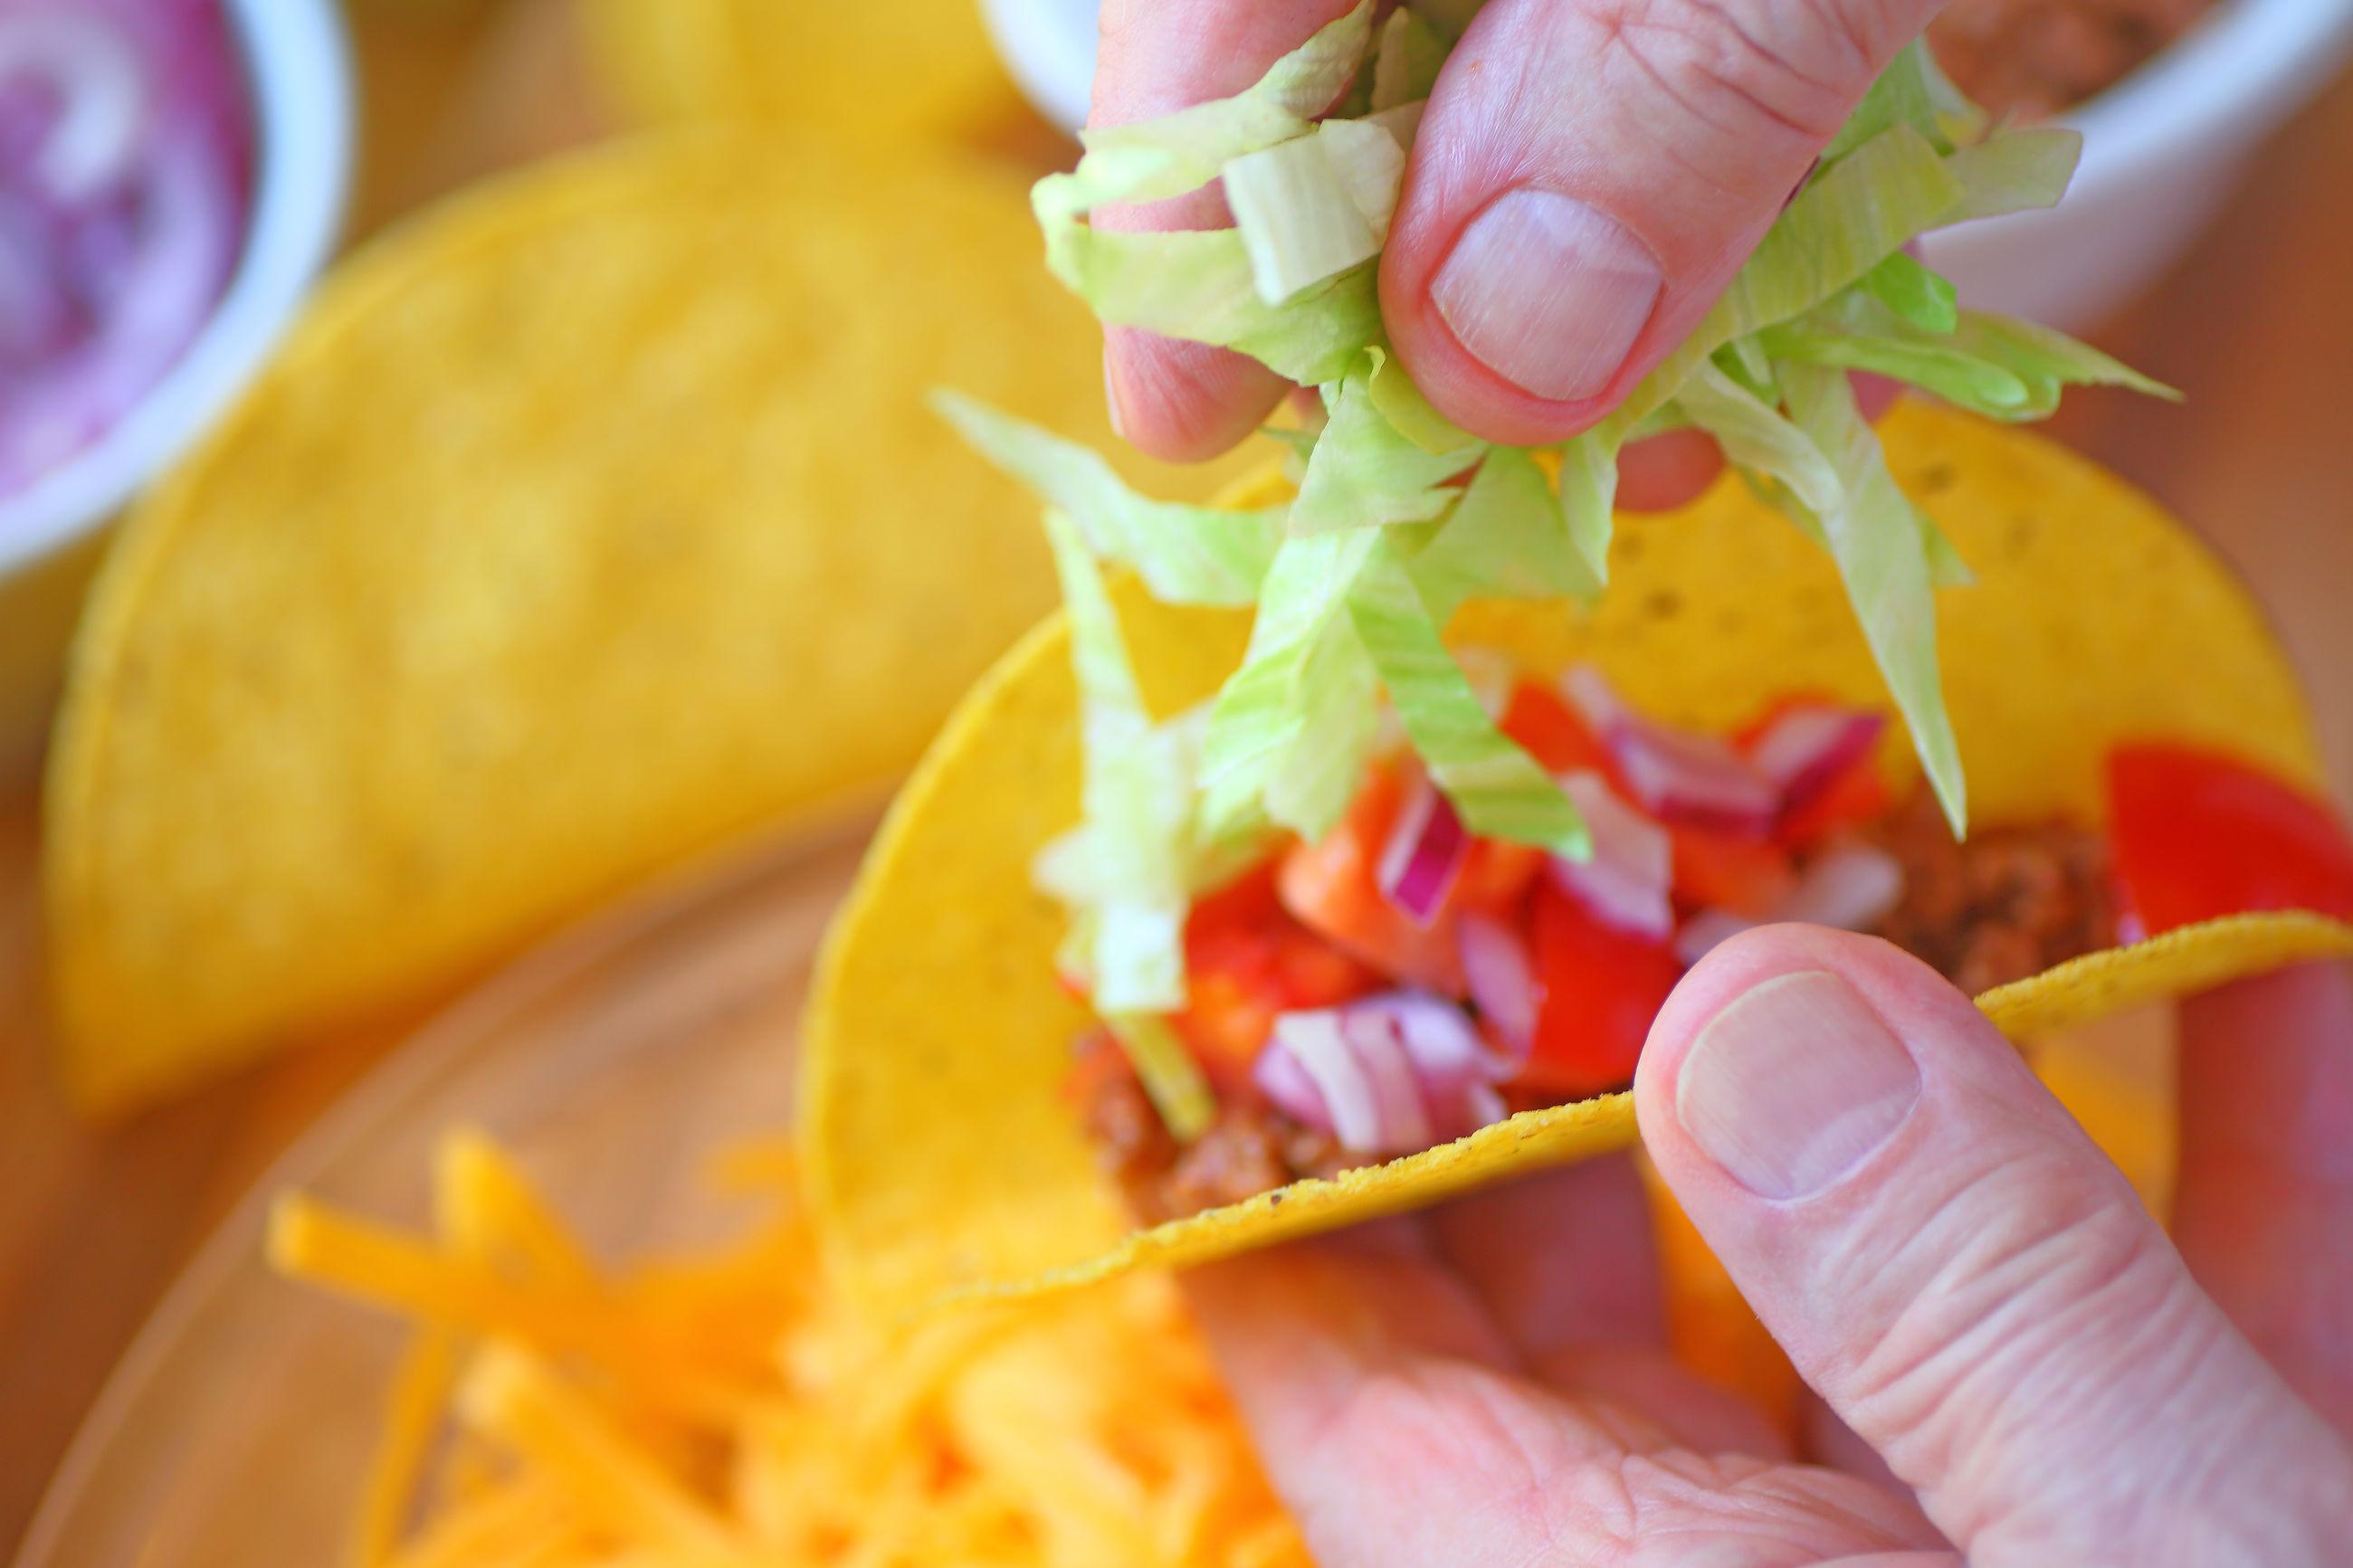 Close-up of hand holding preparing taco